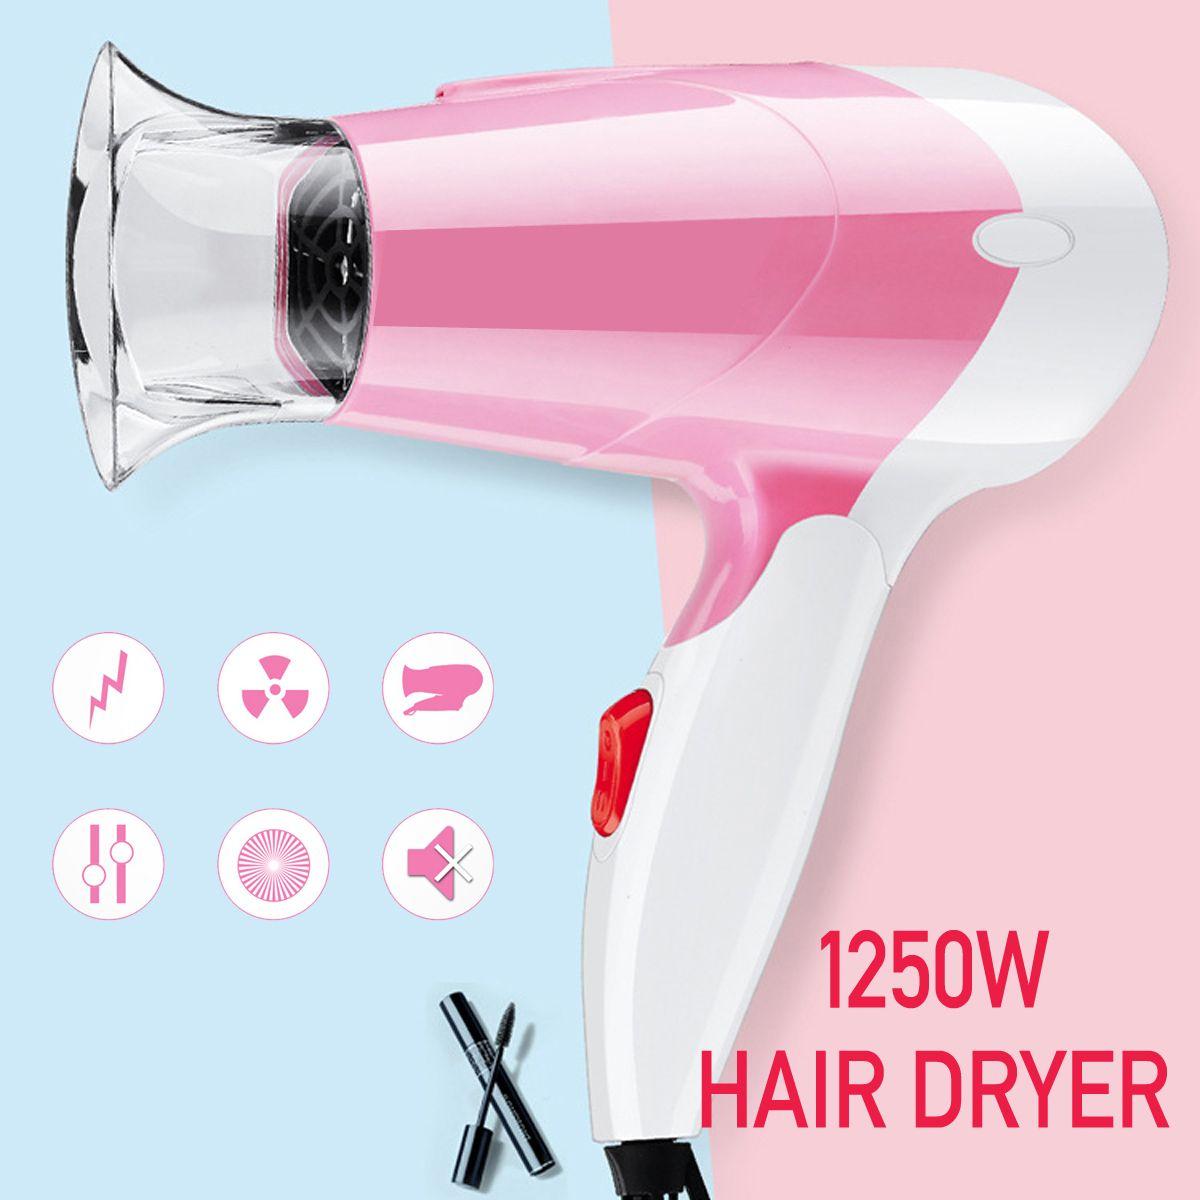 220v 1250w Mini Hairdressing Salon Hair Dryer Foldable Handle